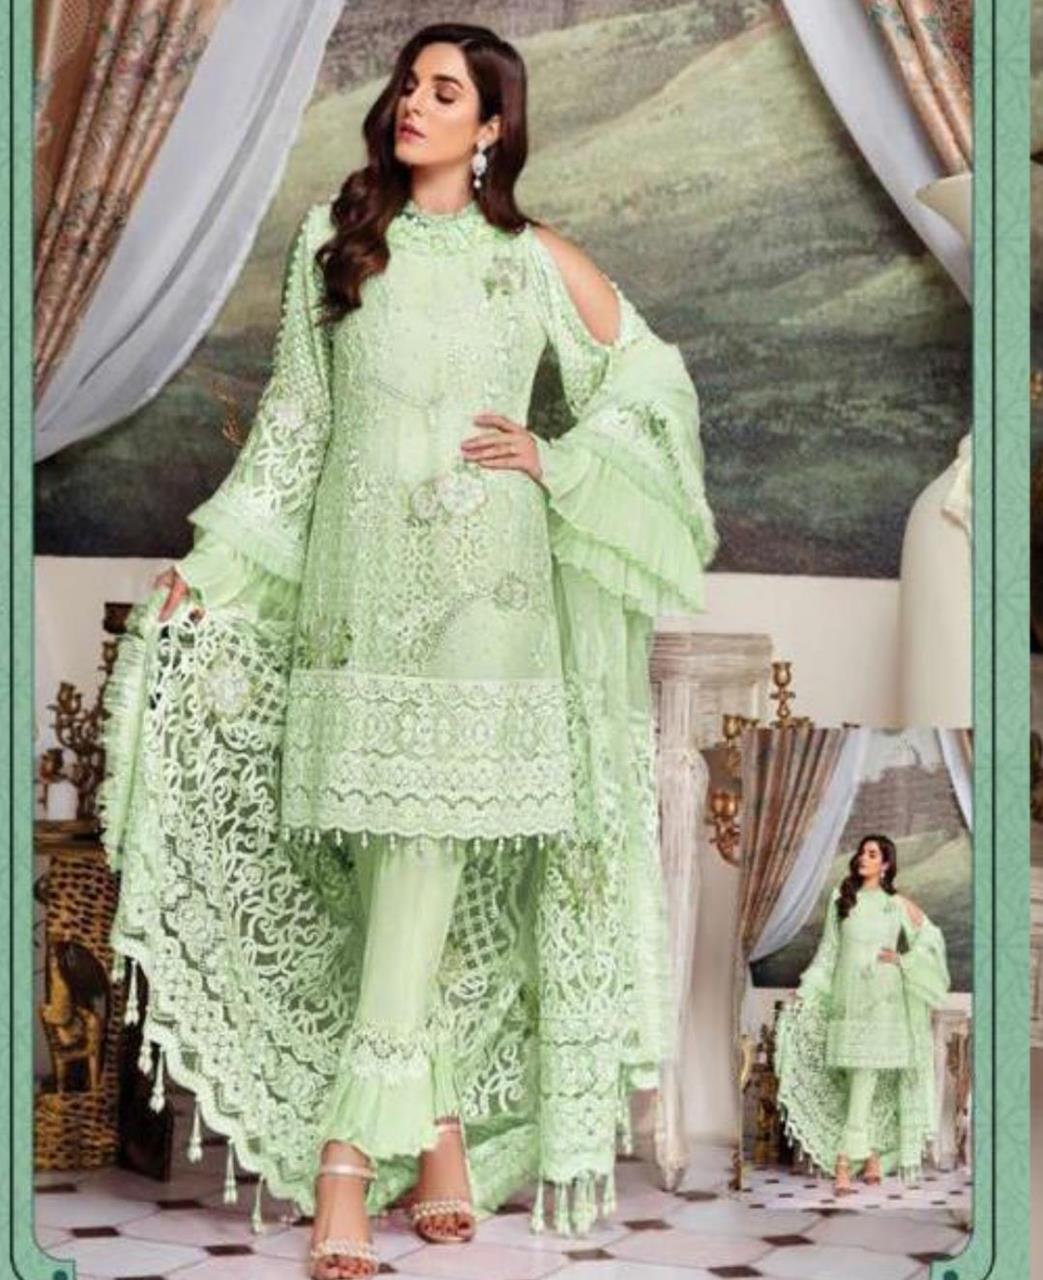 Embroidered Georgette Straight cut Salwar Kameez in Pista